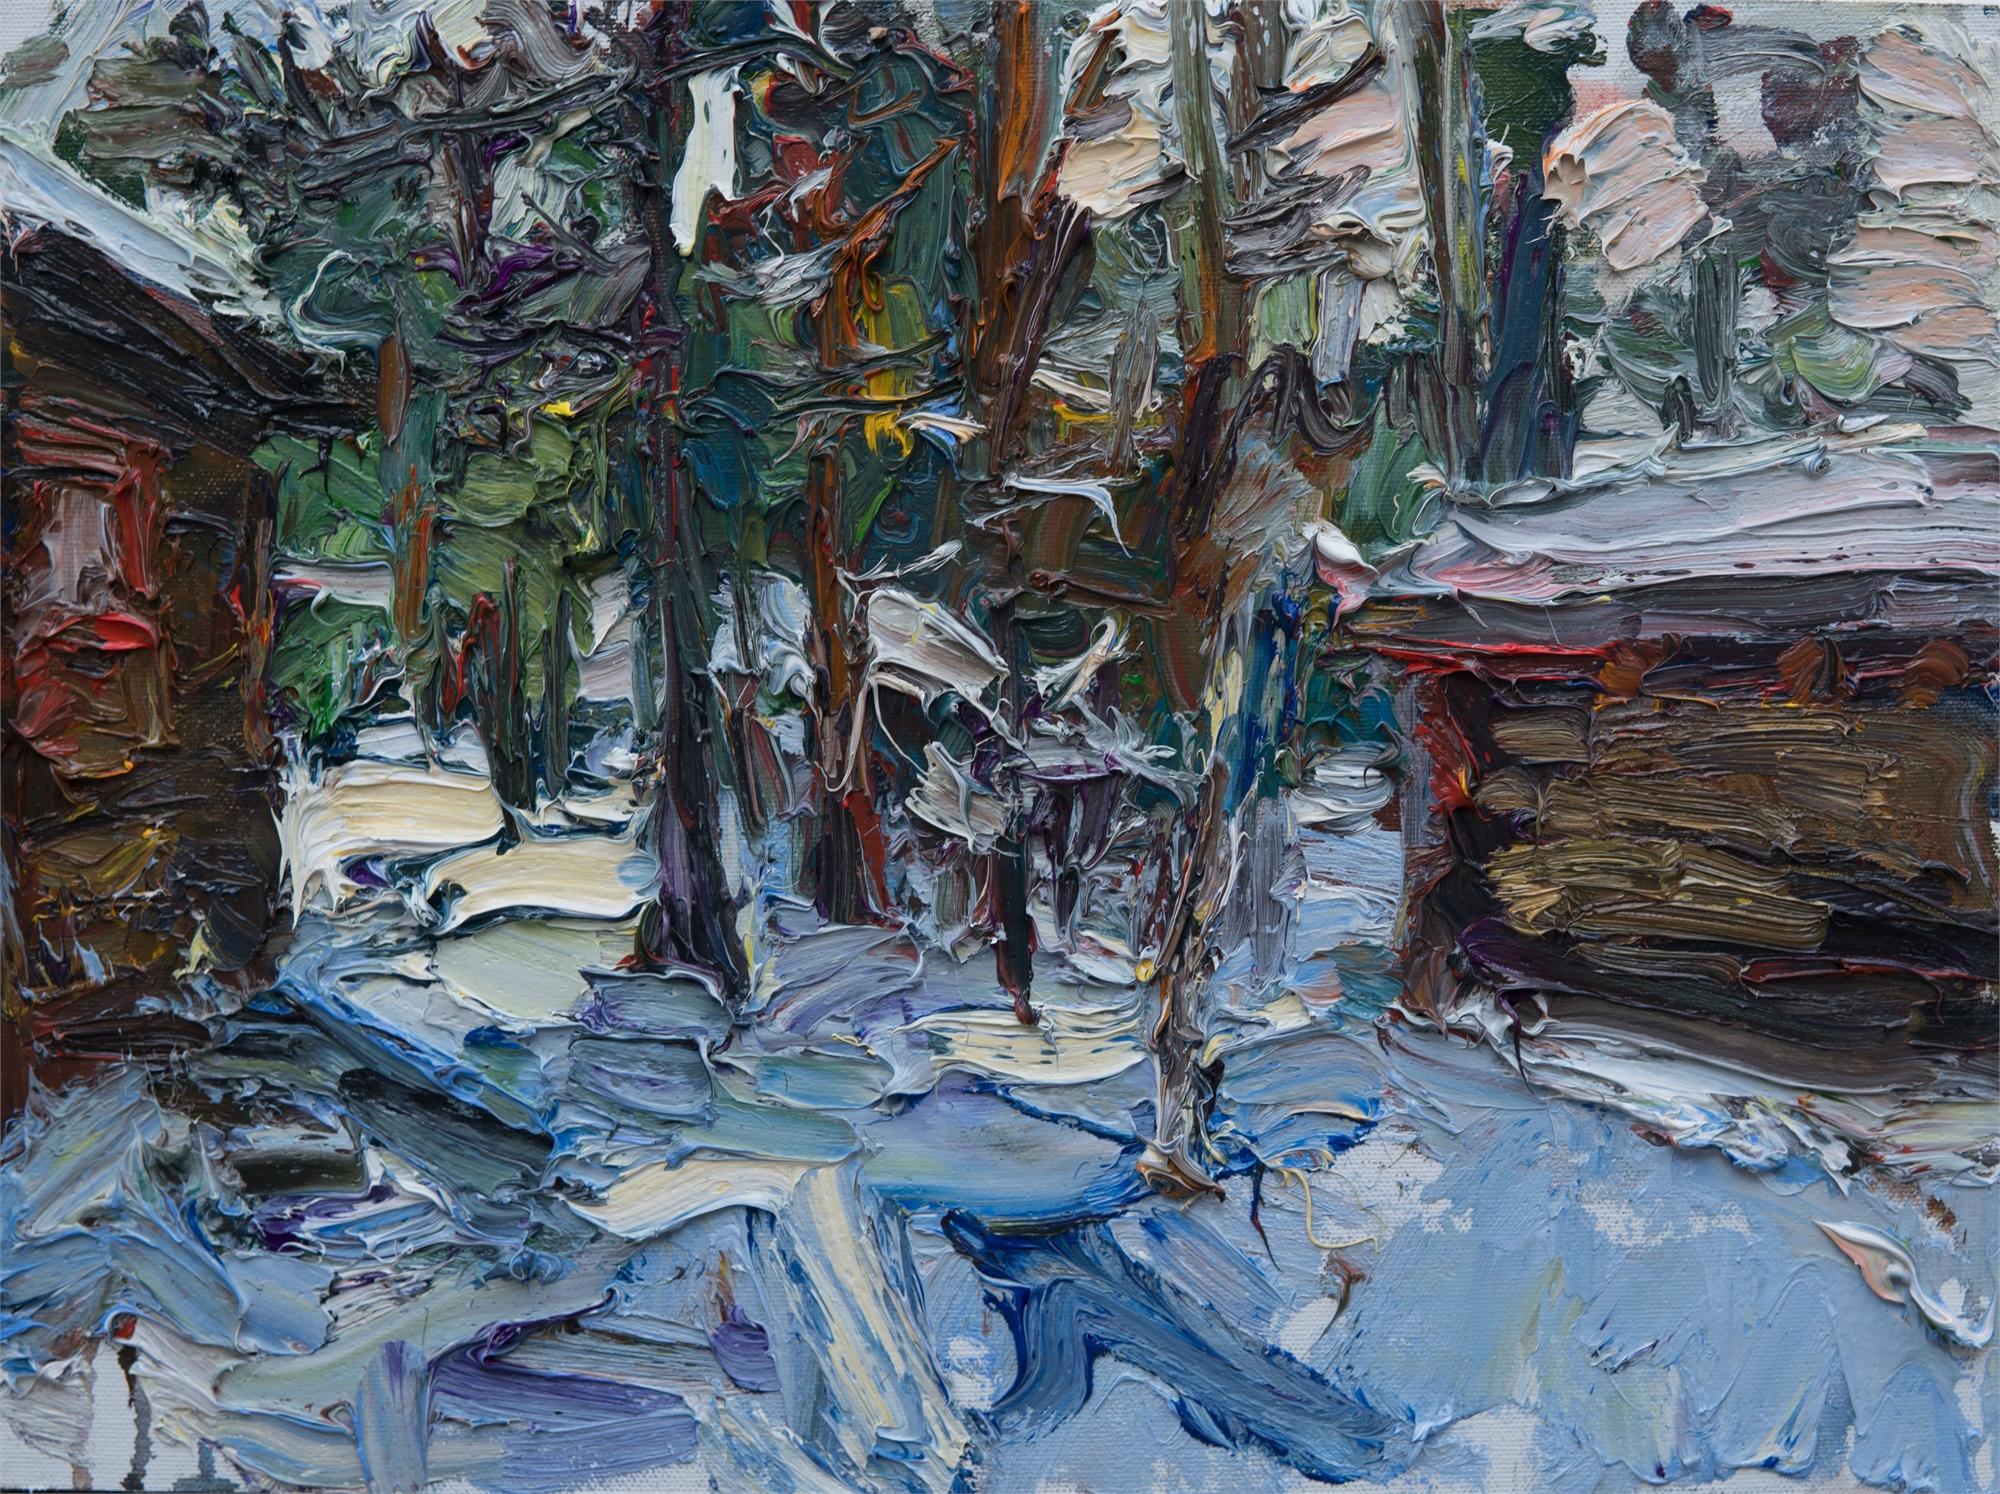 My Cabin: Winter in Finland by Ulrich Gleiter